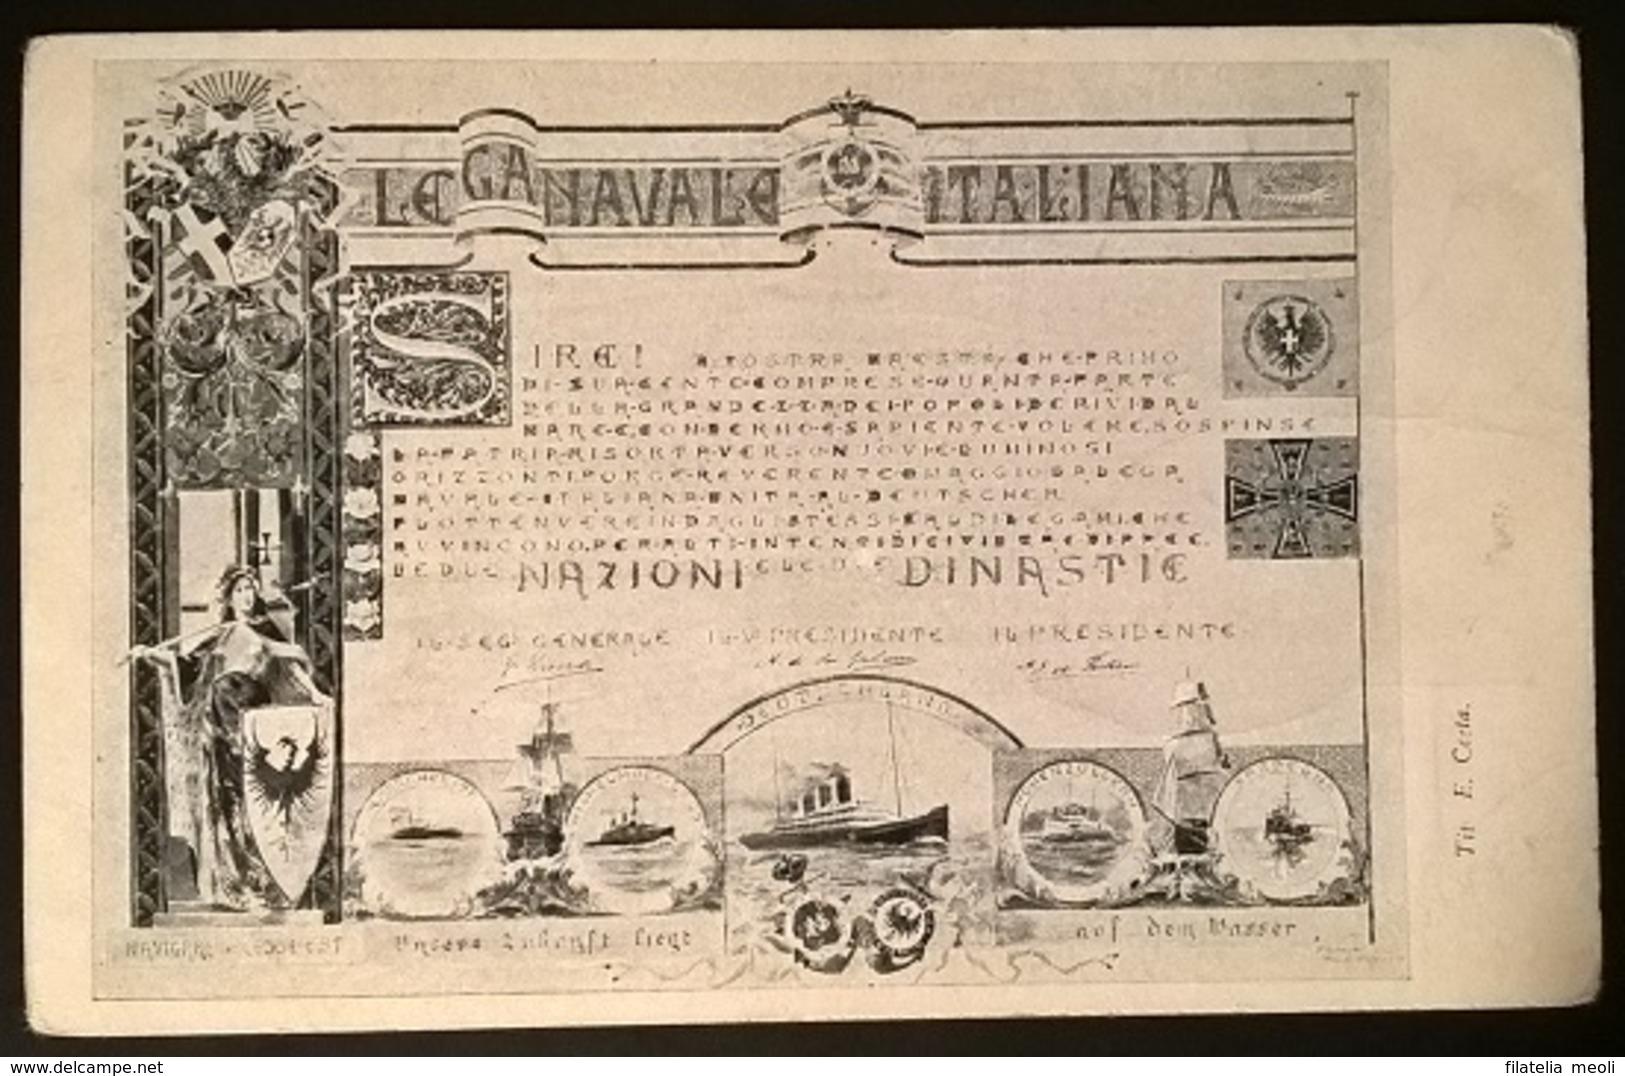 LEGA NAVALE ITALIANA - Guerra